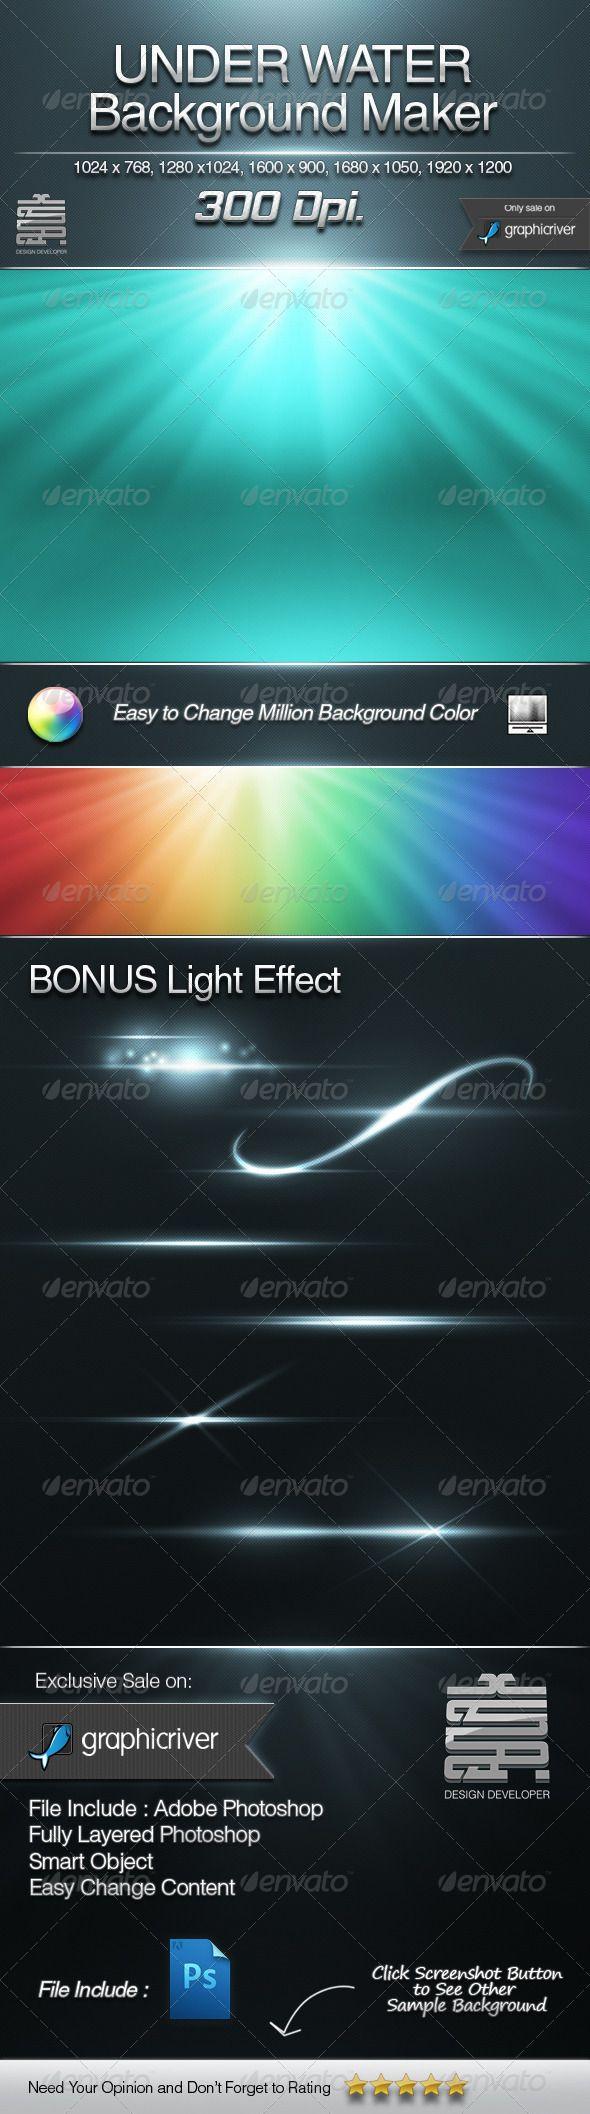 UNDER WATER Background maker & Bonus Light Effect